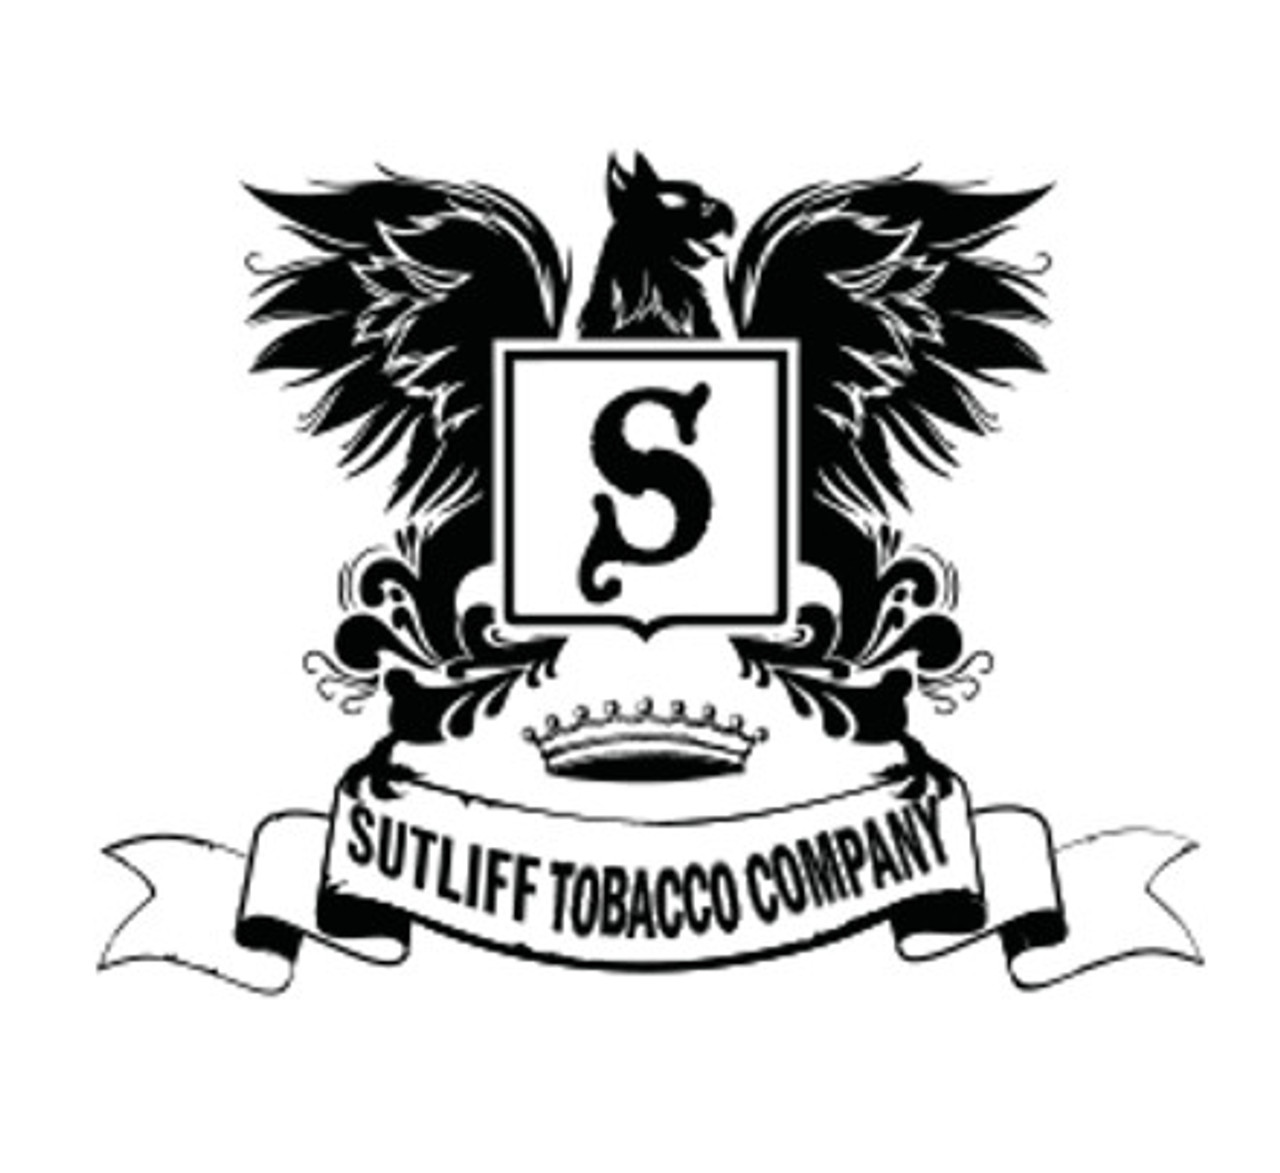 Sutliff SPS2000 Sunset Rum Bulk Pipe Tobacco 5 LB